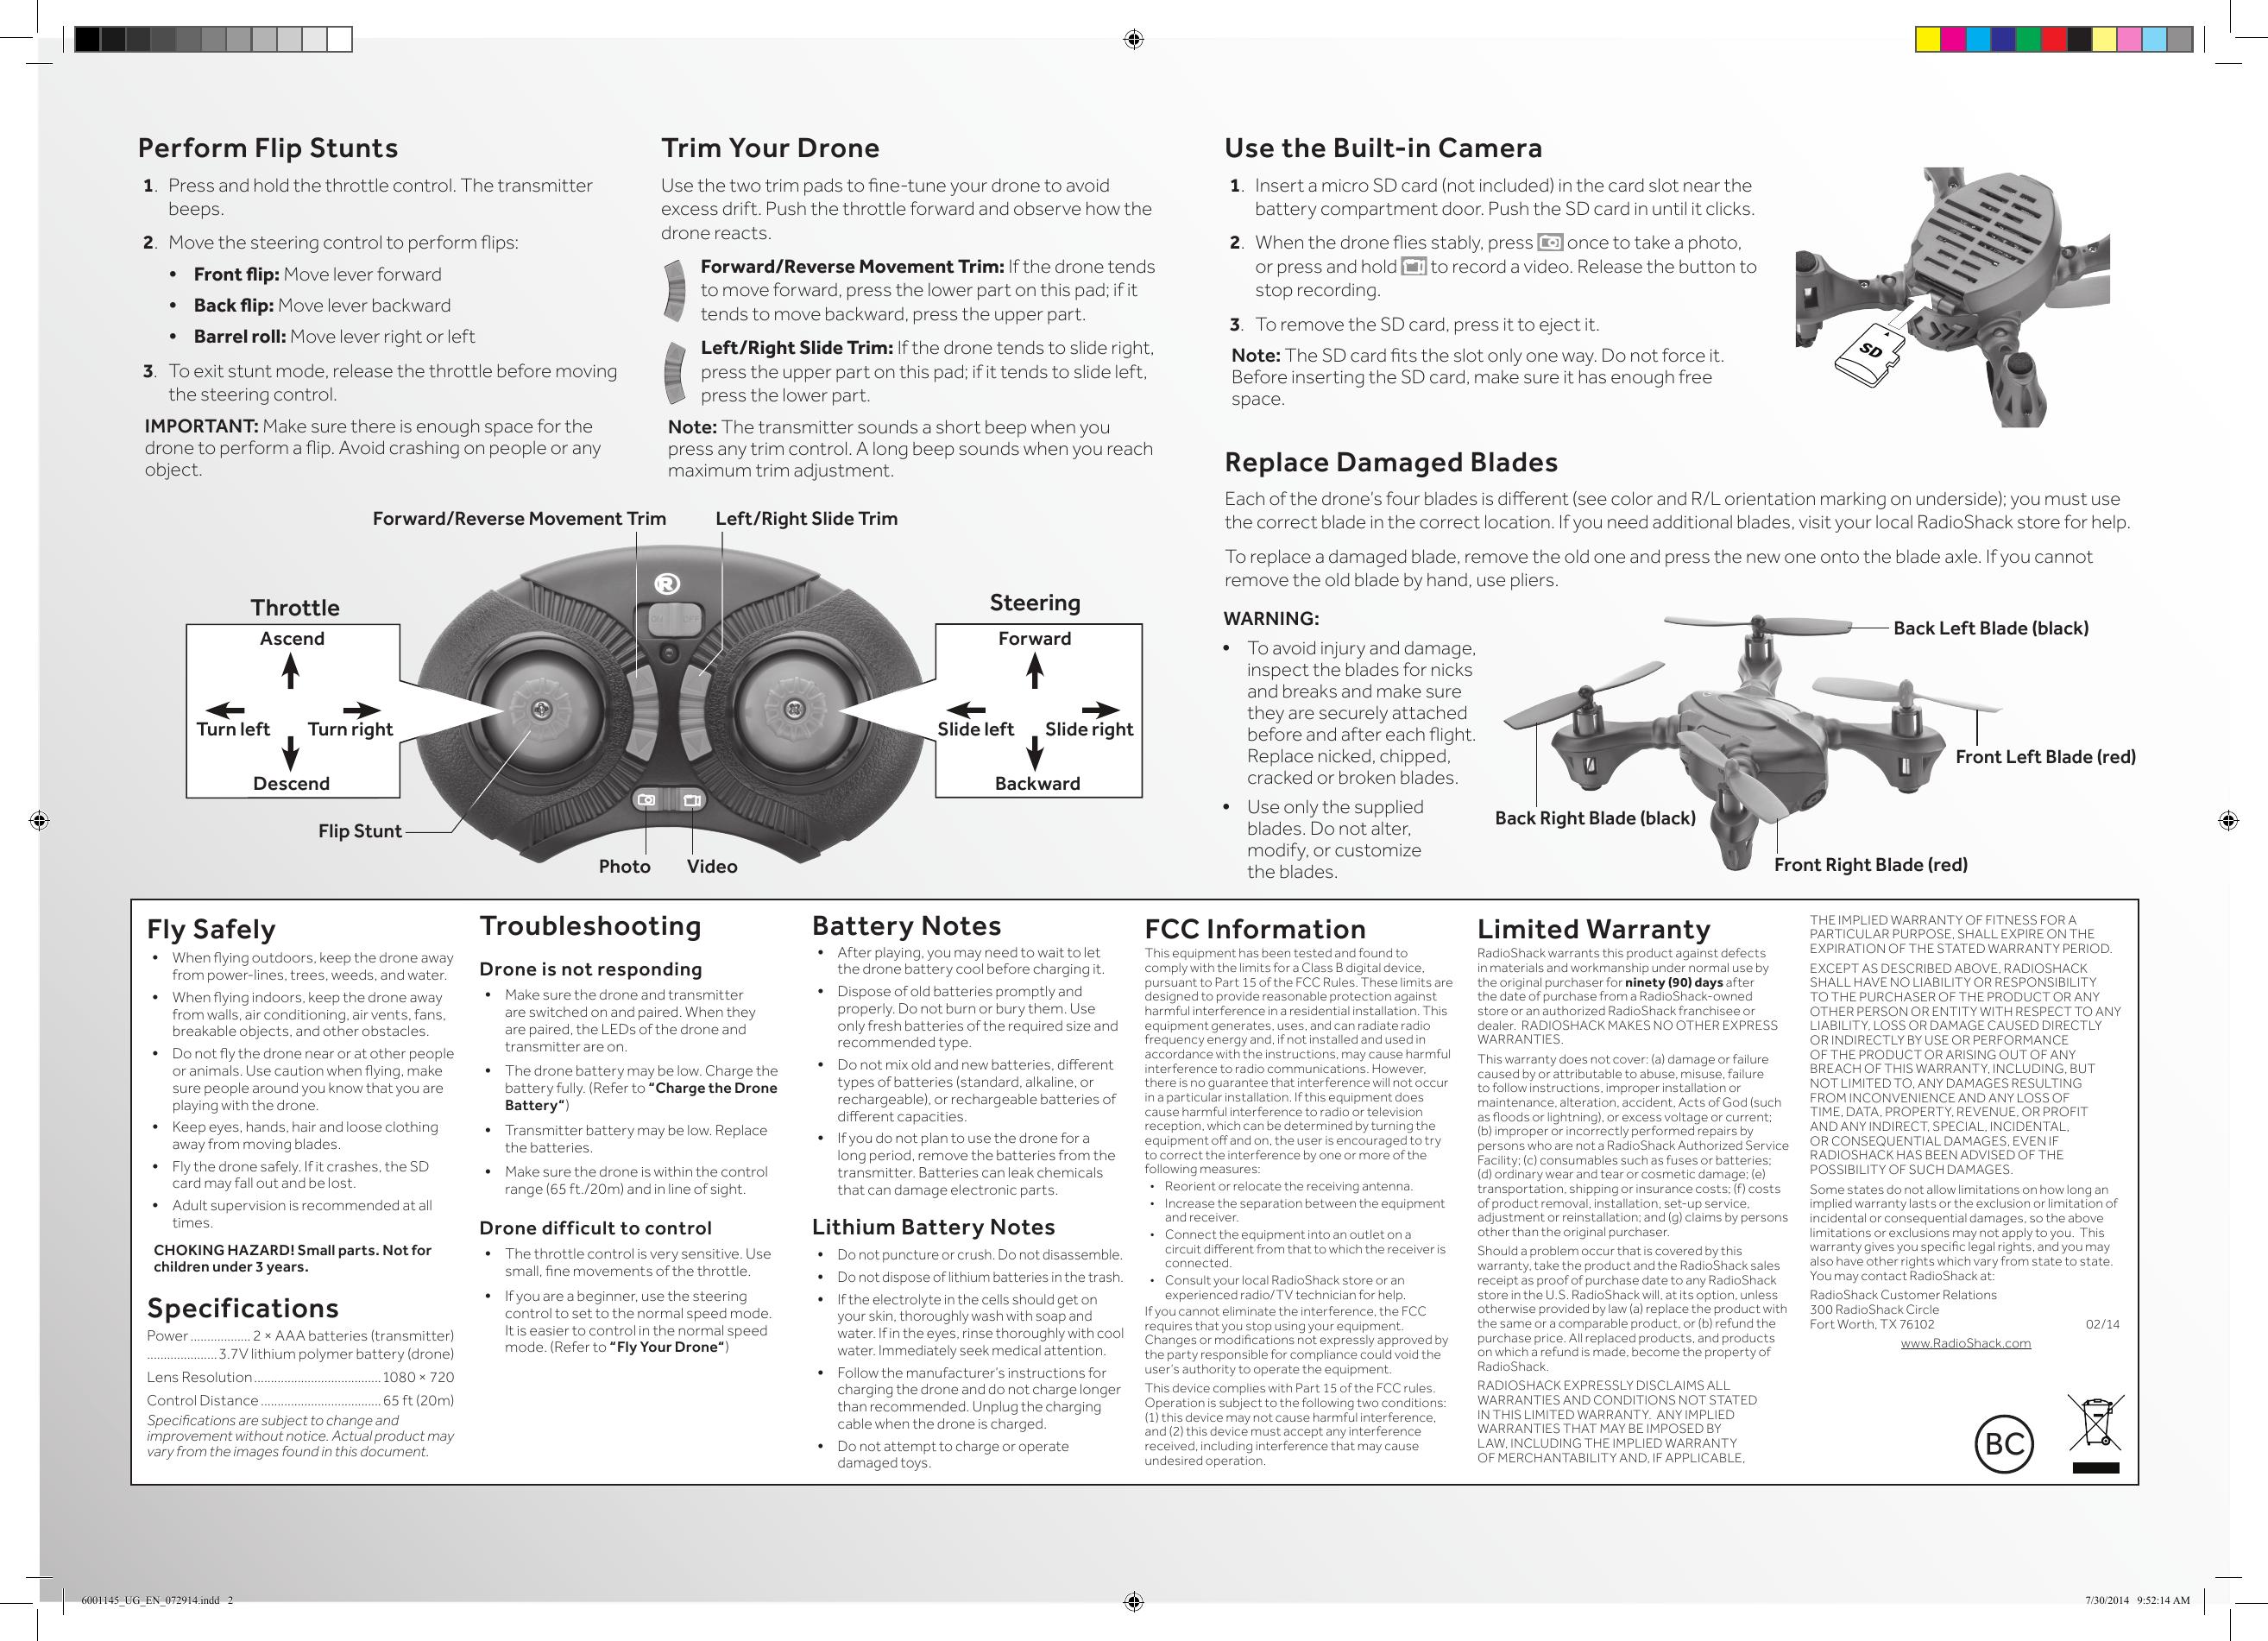 ZEGO ELECTRONIC 2RX Receiver of Surveyor Drone User Manual